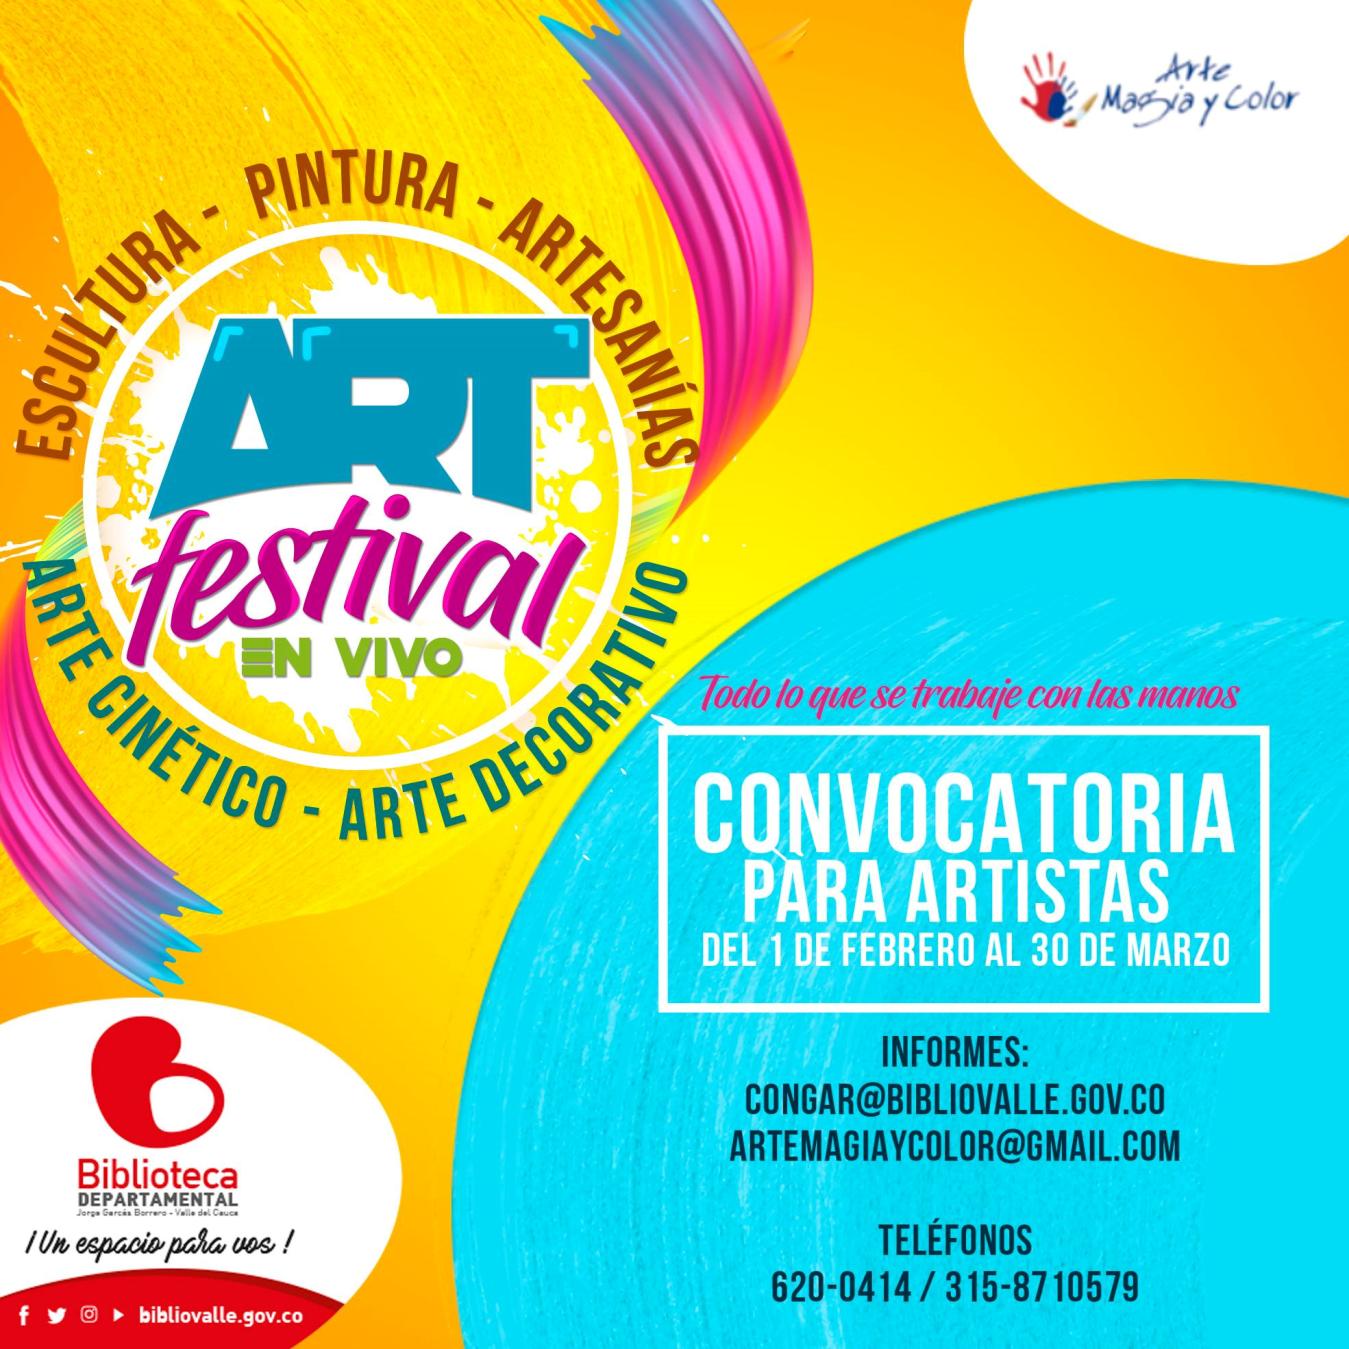 ART FESTIVAL EN VIVO - 8-1